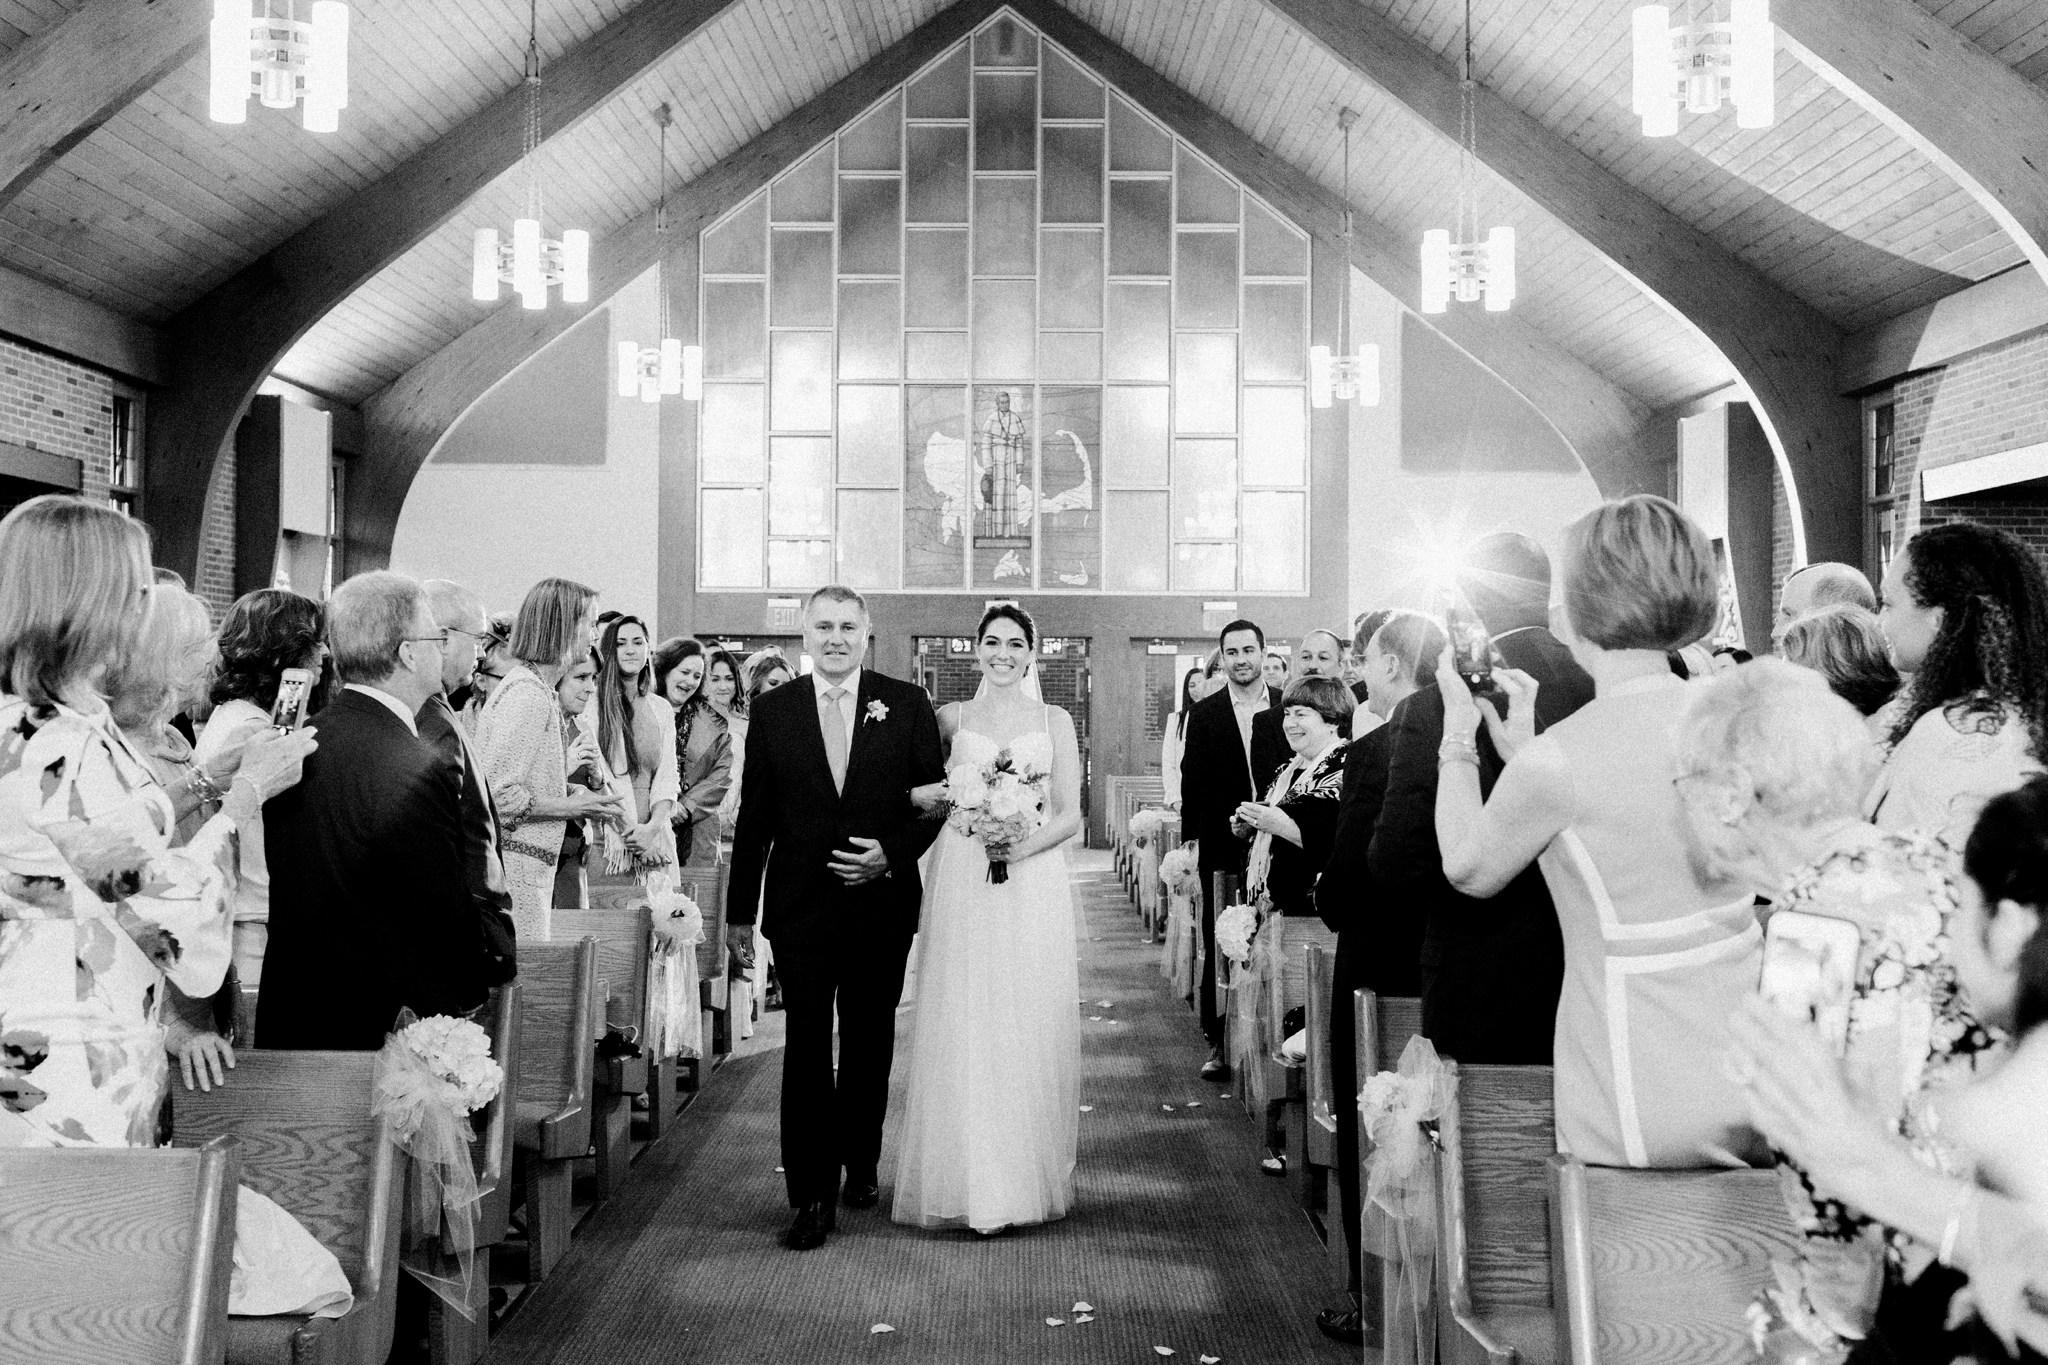 cape_cod_wedding_deborah_zoe_Photography_00027.JPG